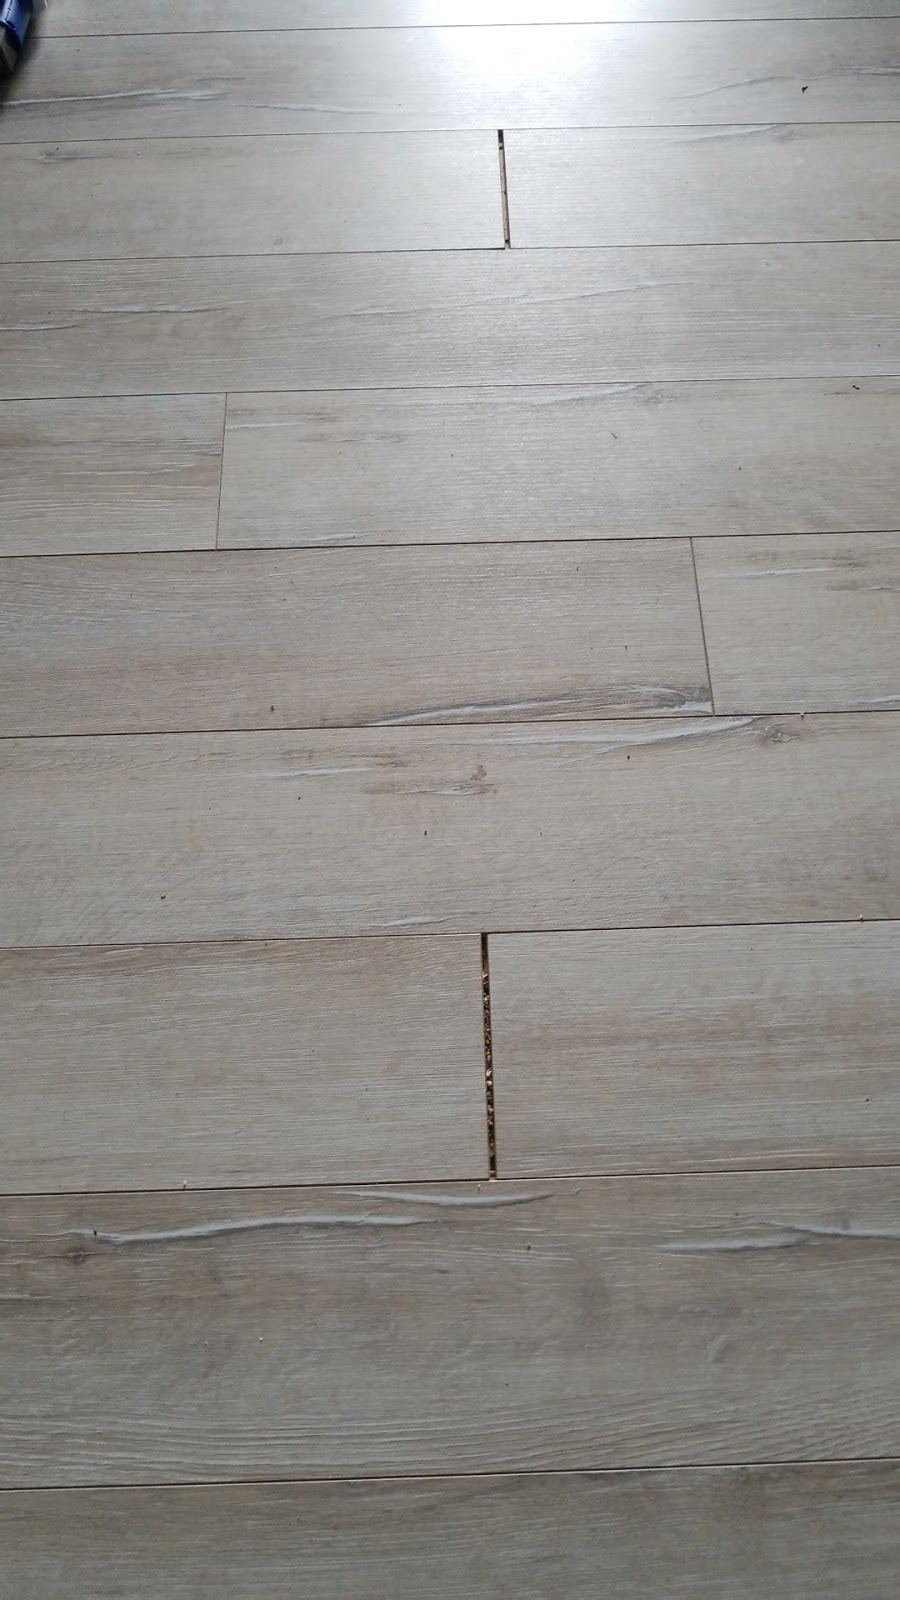 AC Flooring & Installations (2004) Ltd | home goods store | 2304 Millar Ave, Saskatoon, SK S7K 2Y2, Canada | 3069313414 OR +1 306-931-3414